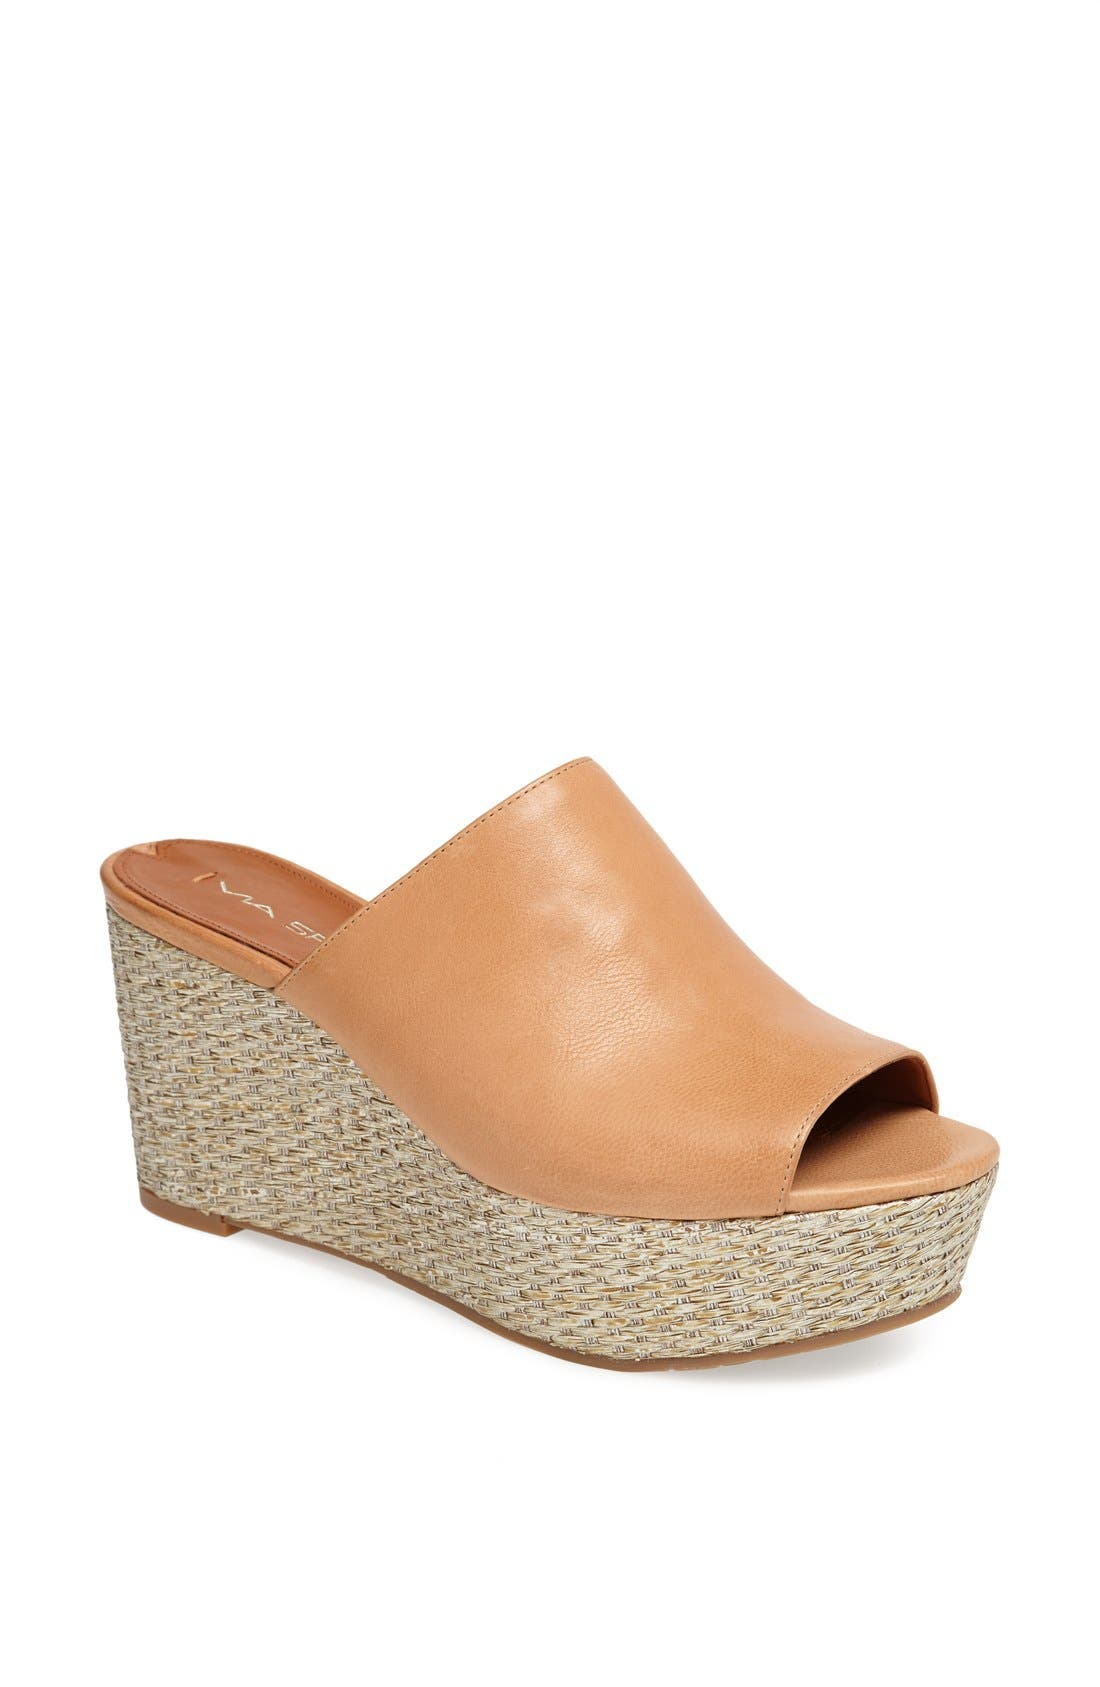 Alternate Image 1 Selected - Via Spiga 'Hale' Wedge Sandal